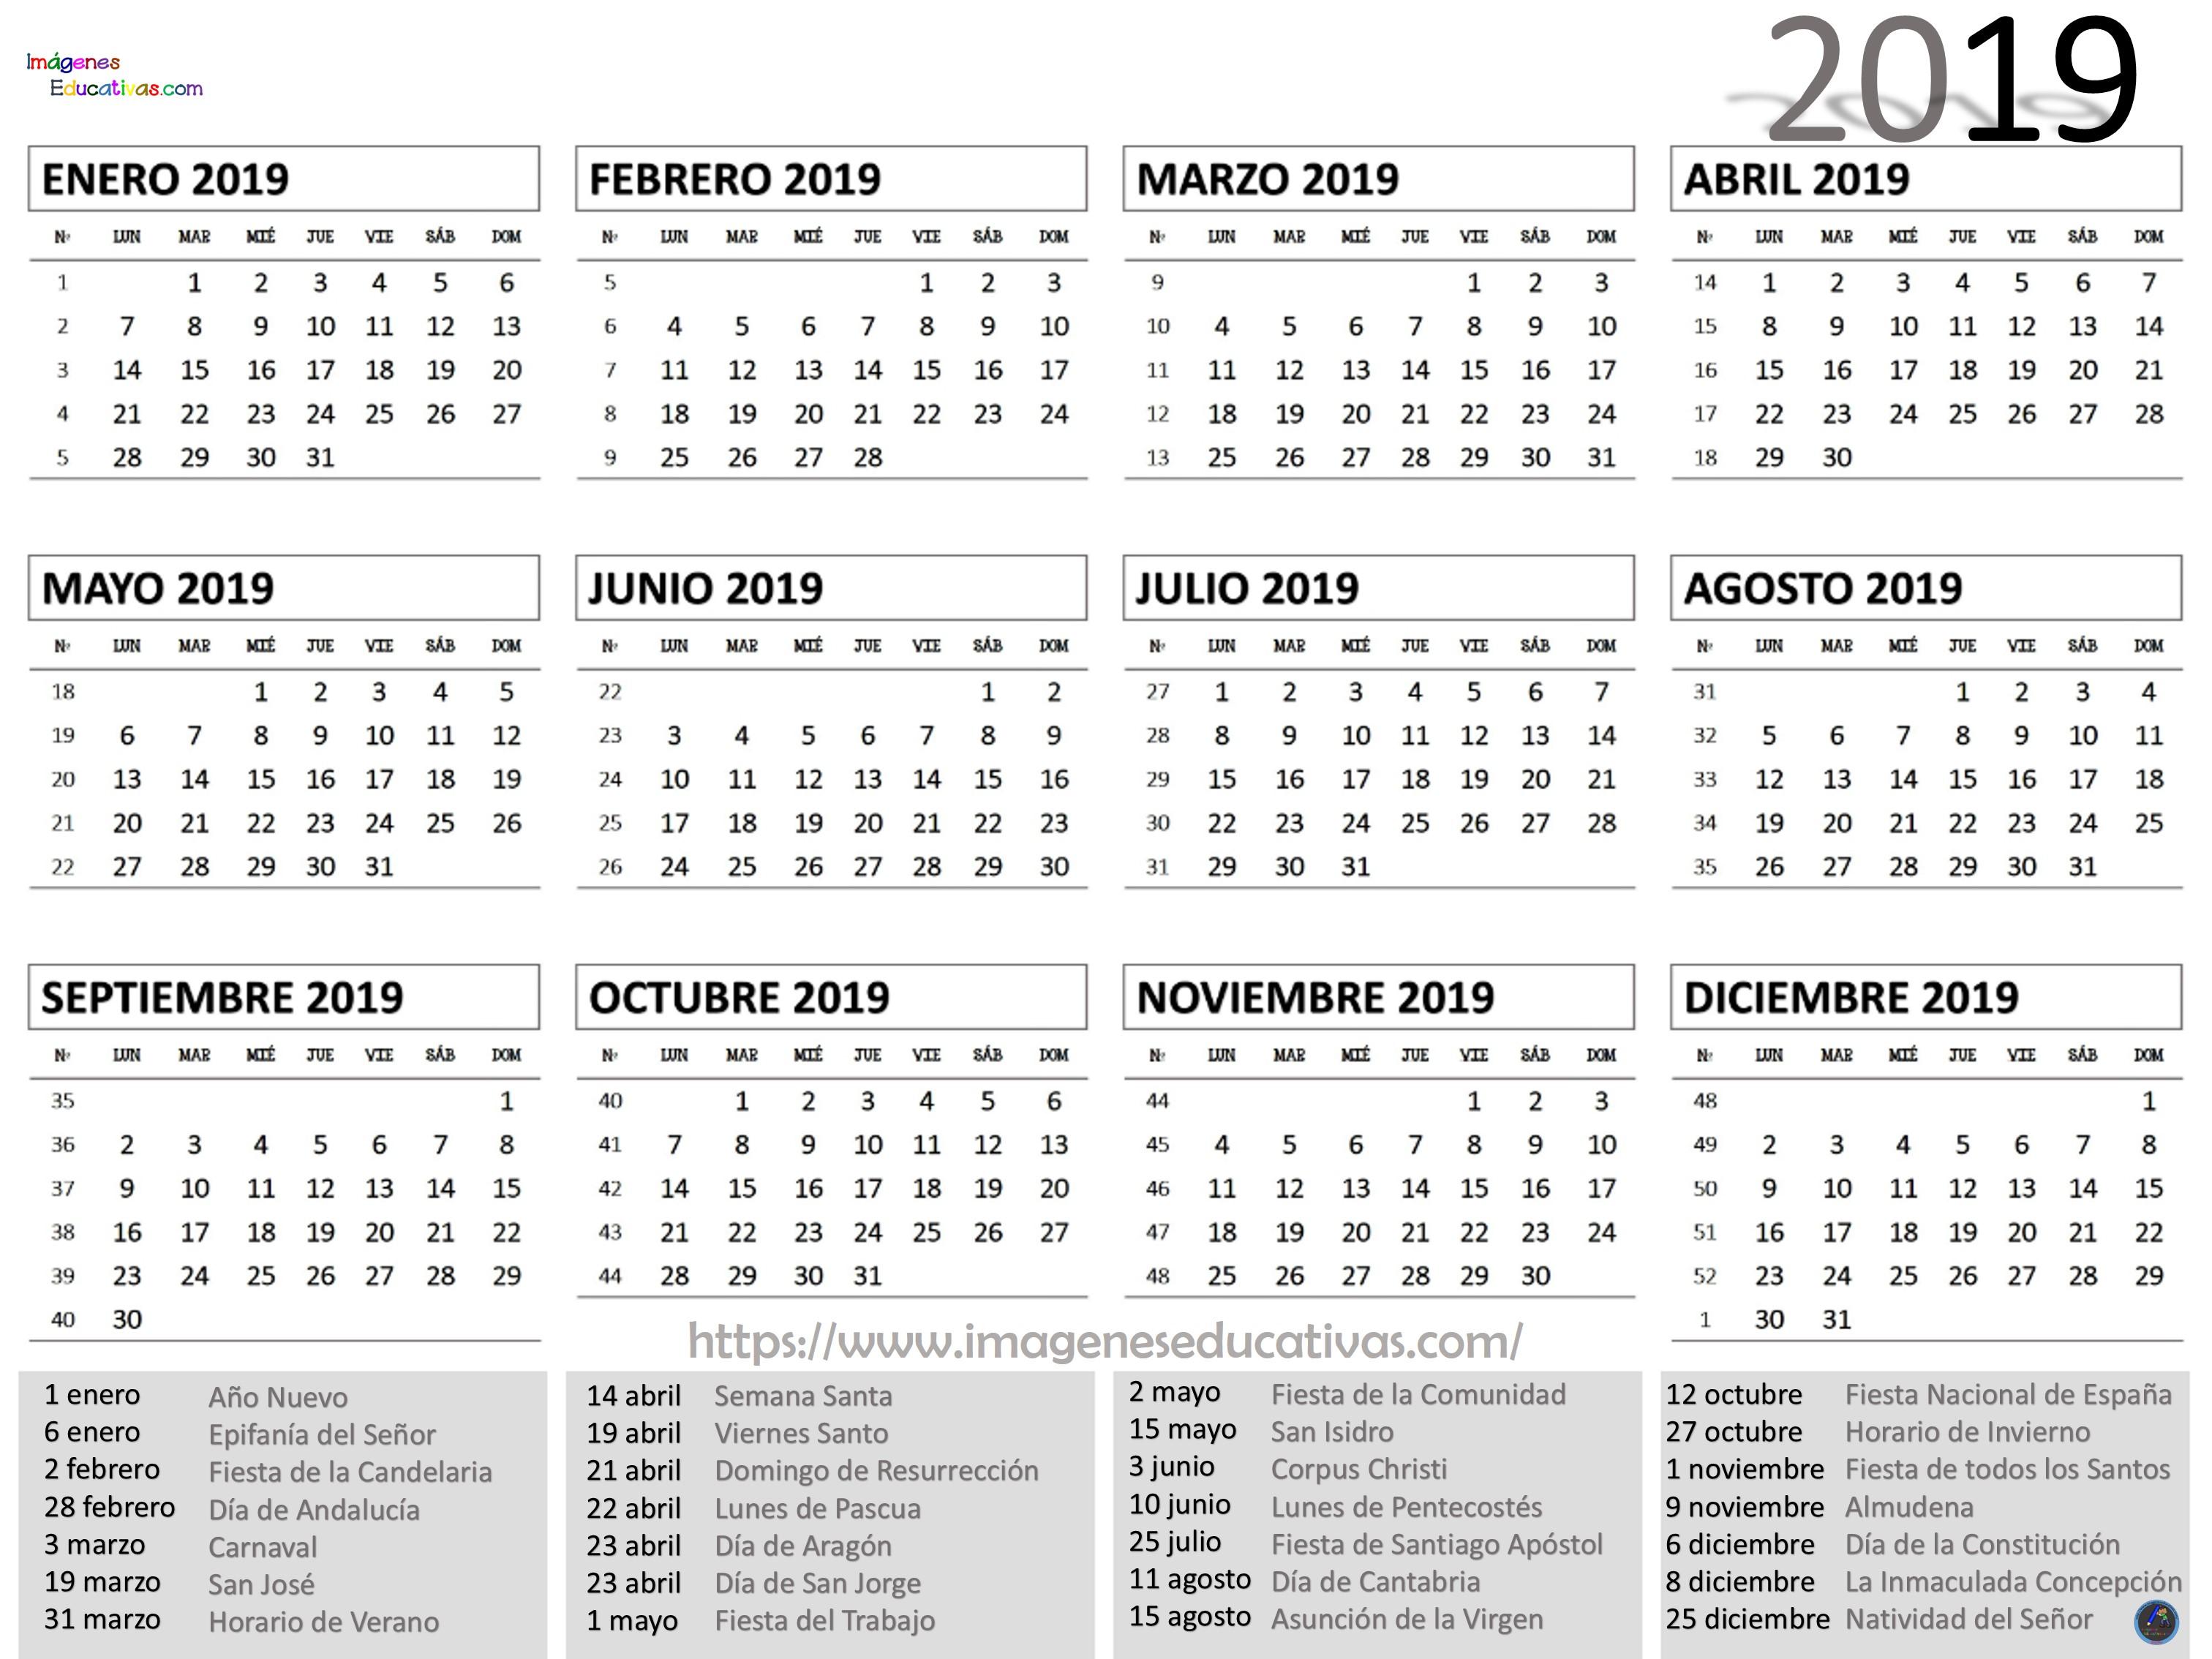 Calendario Mes De Octubre 2020 Para Imprimir.Calendario 2019 Mas De 150 Plantillas Para Imprimir Y